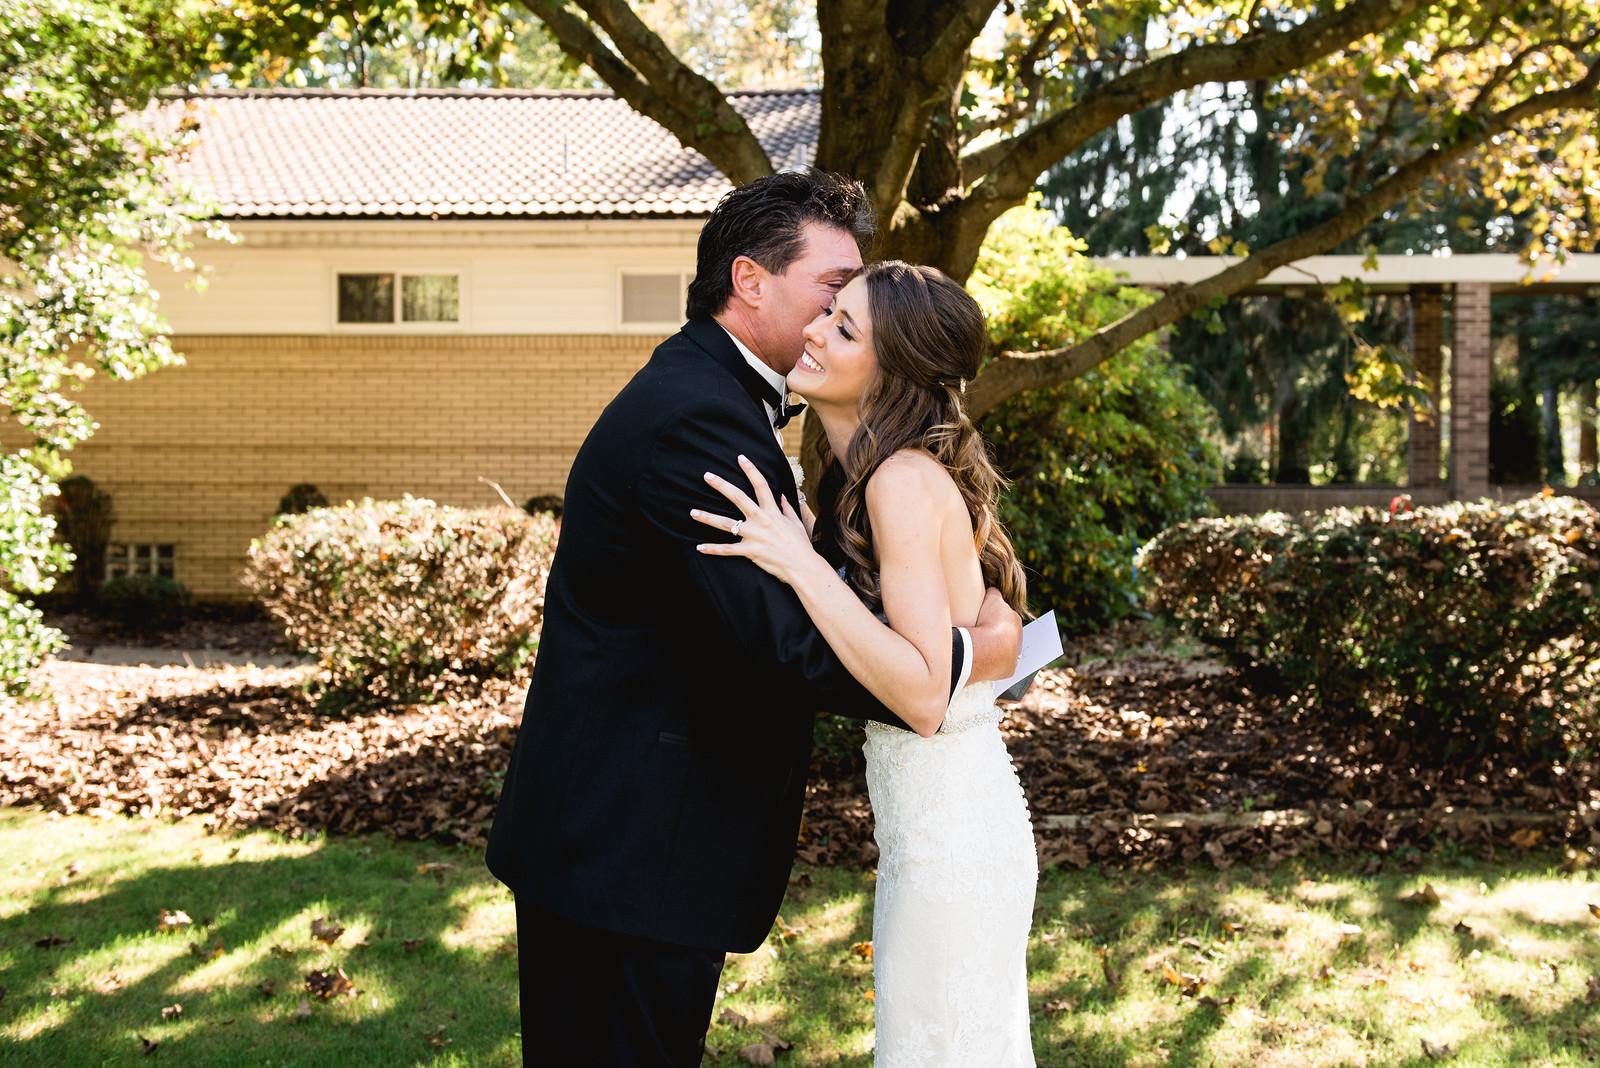 first_look_on_wedding_day5.jpg